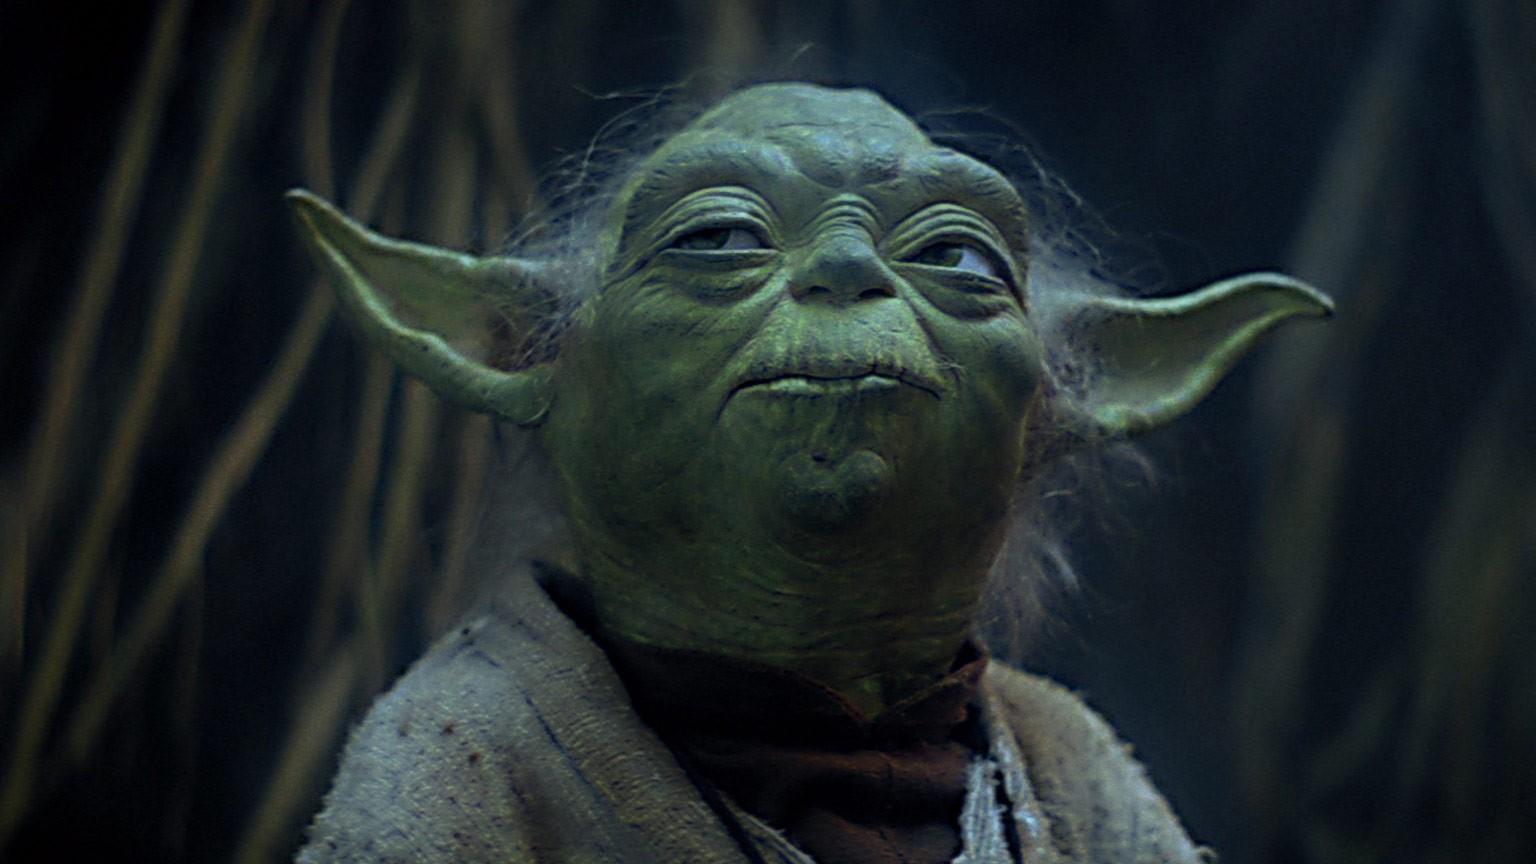 O mestre jedi Yoda